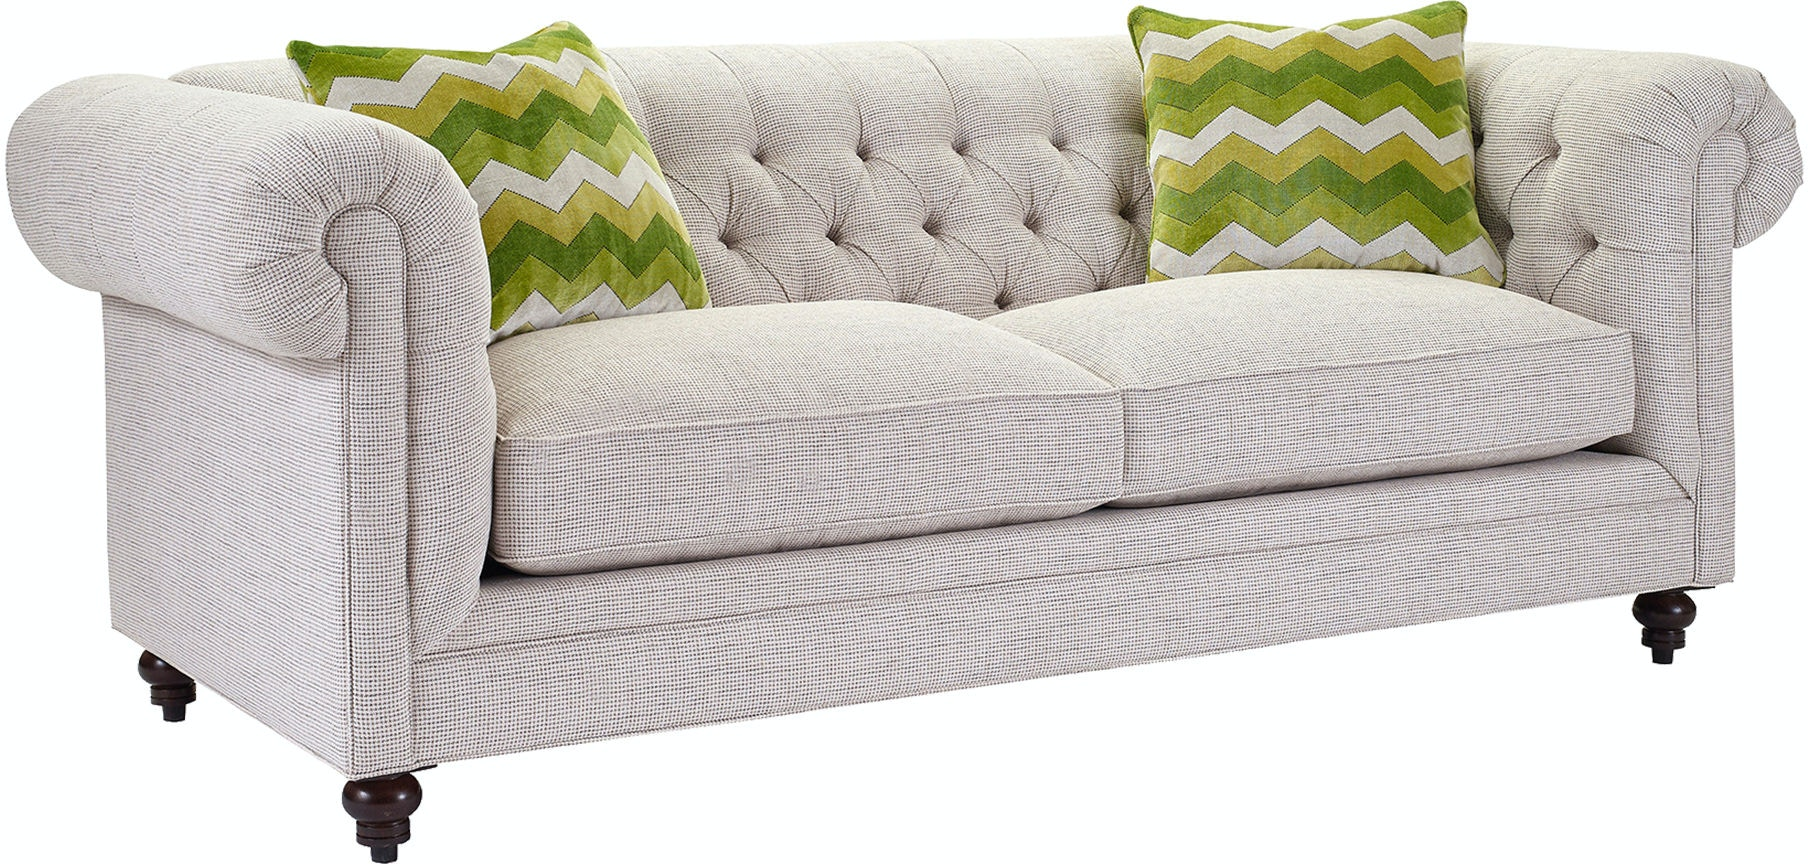 Broyhill Living Room Heath Sofa 4268 3 Homique